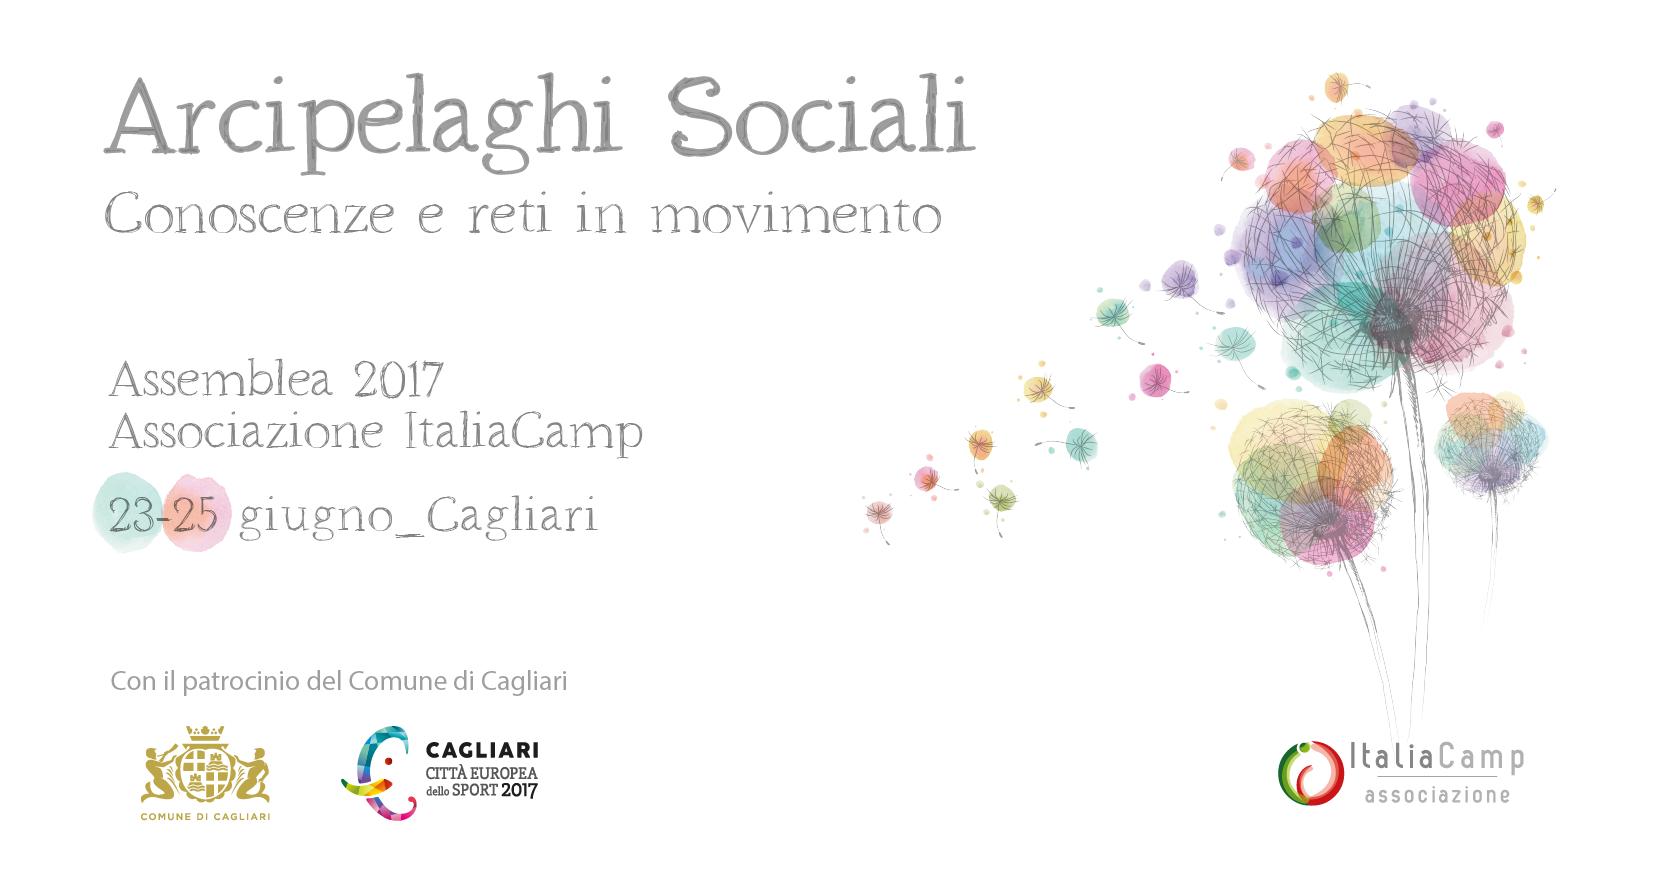 Assemblea ItaliaCamp Arcipelaghi Sociali